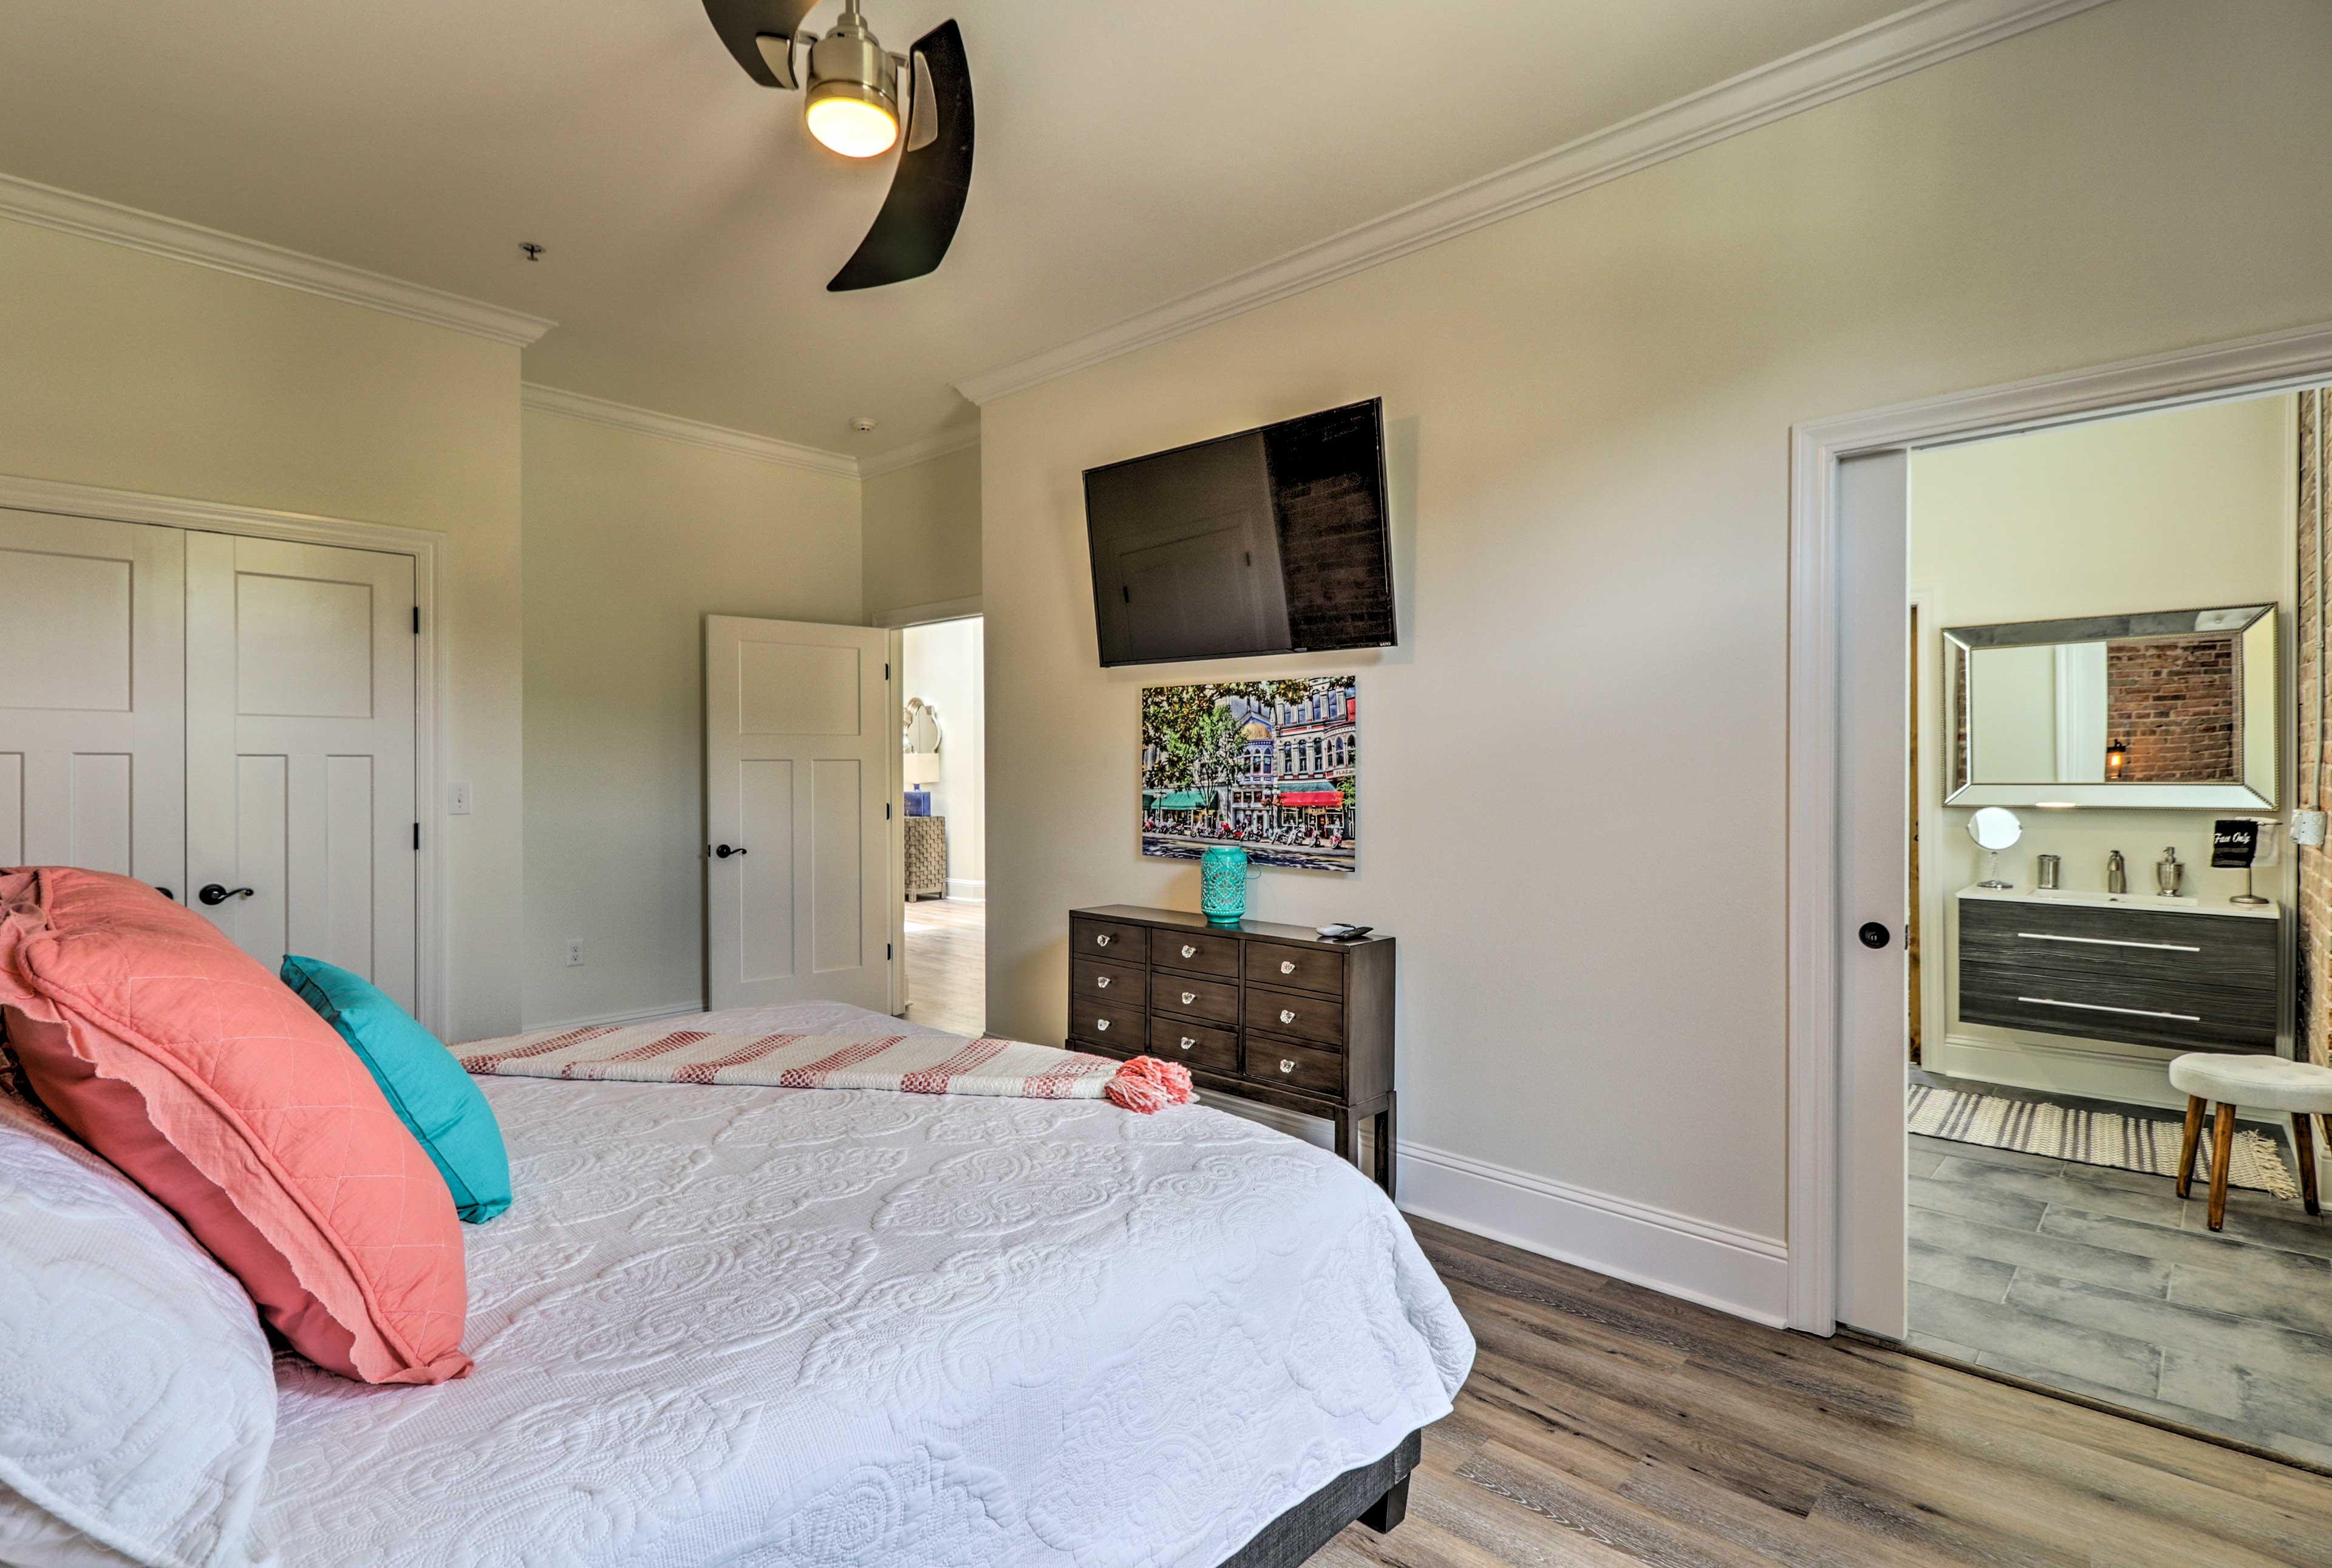 Both bedrooms contain 55-inch flat-screen Smart TVs.